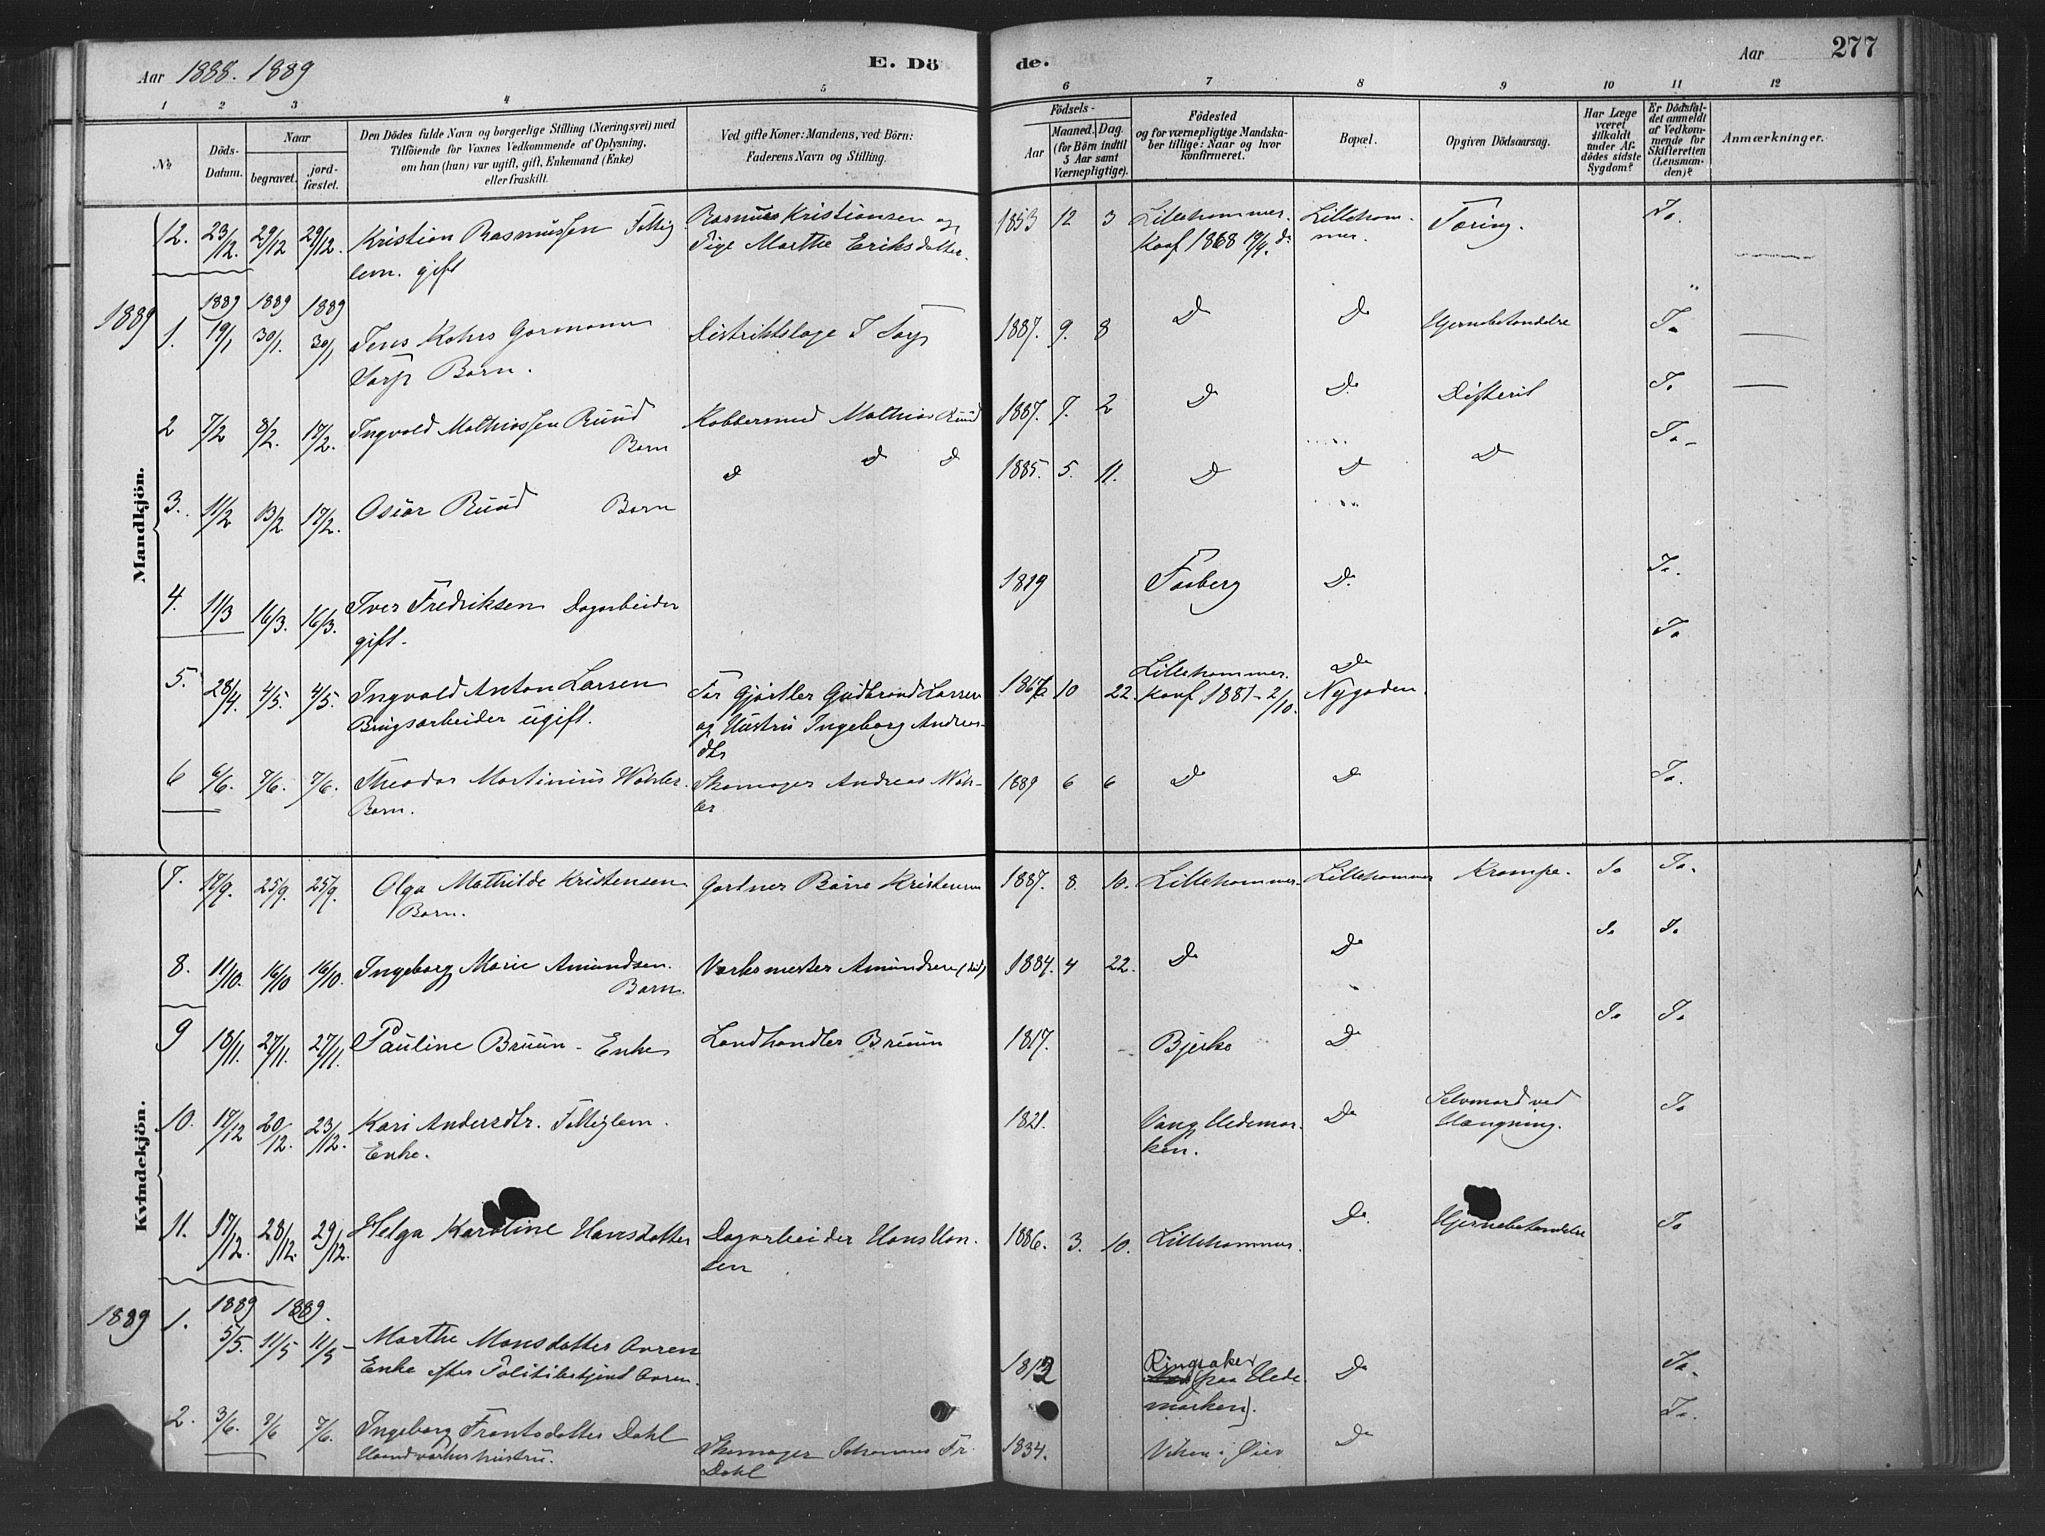 SAH, Fåberg prestekontor, H/Ha/Haa/L0010: Parish register (official) no. 10, 1879-1900, p. 277